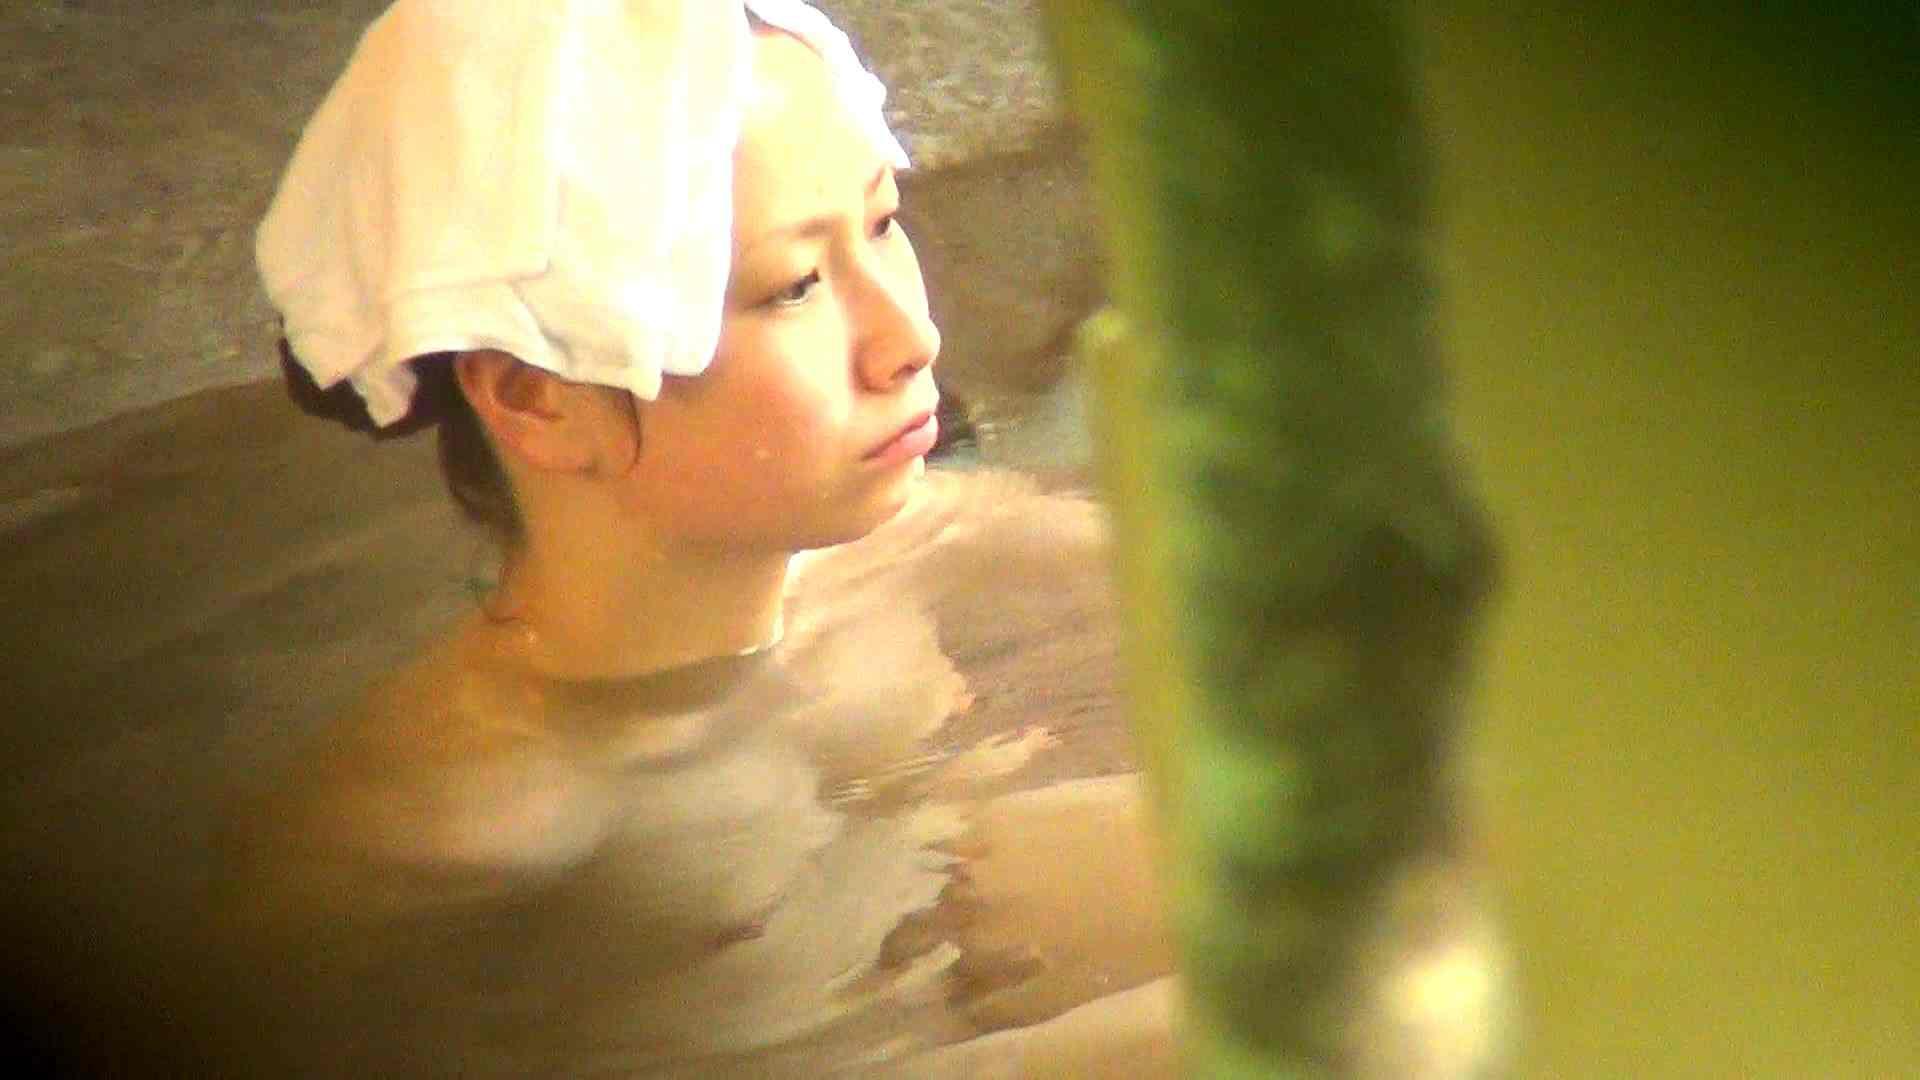 Aquaな露天風呂Vol.266 盗撮シリーズ | 露天風呂編  87PIX 71